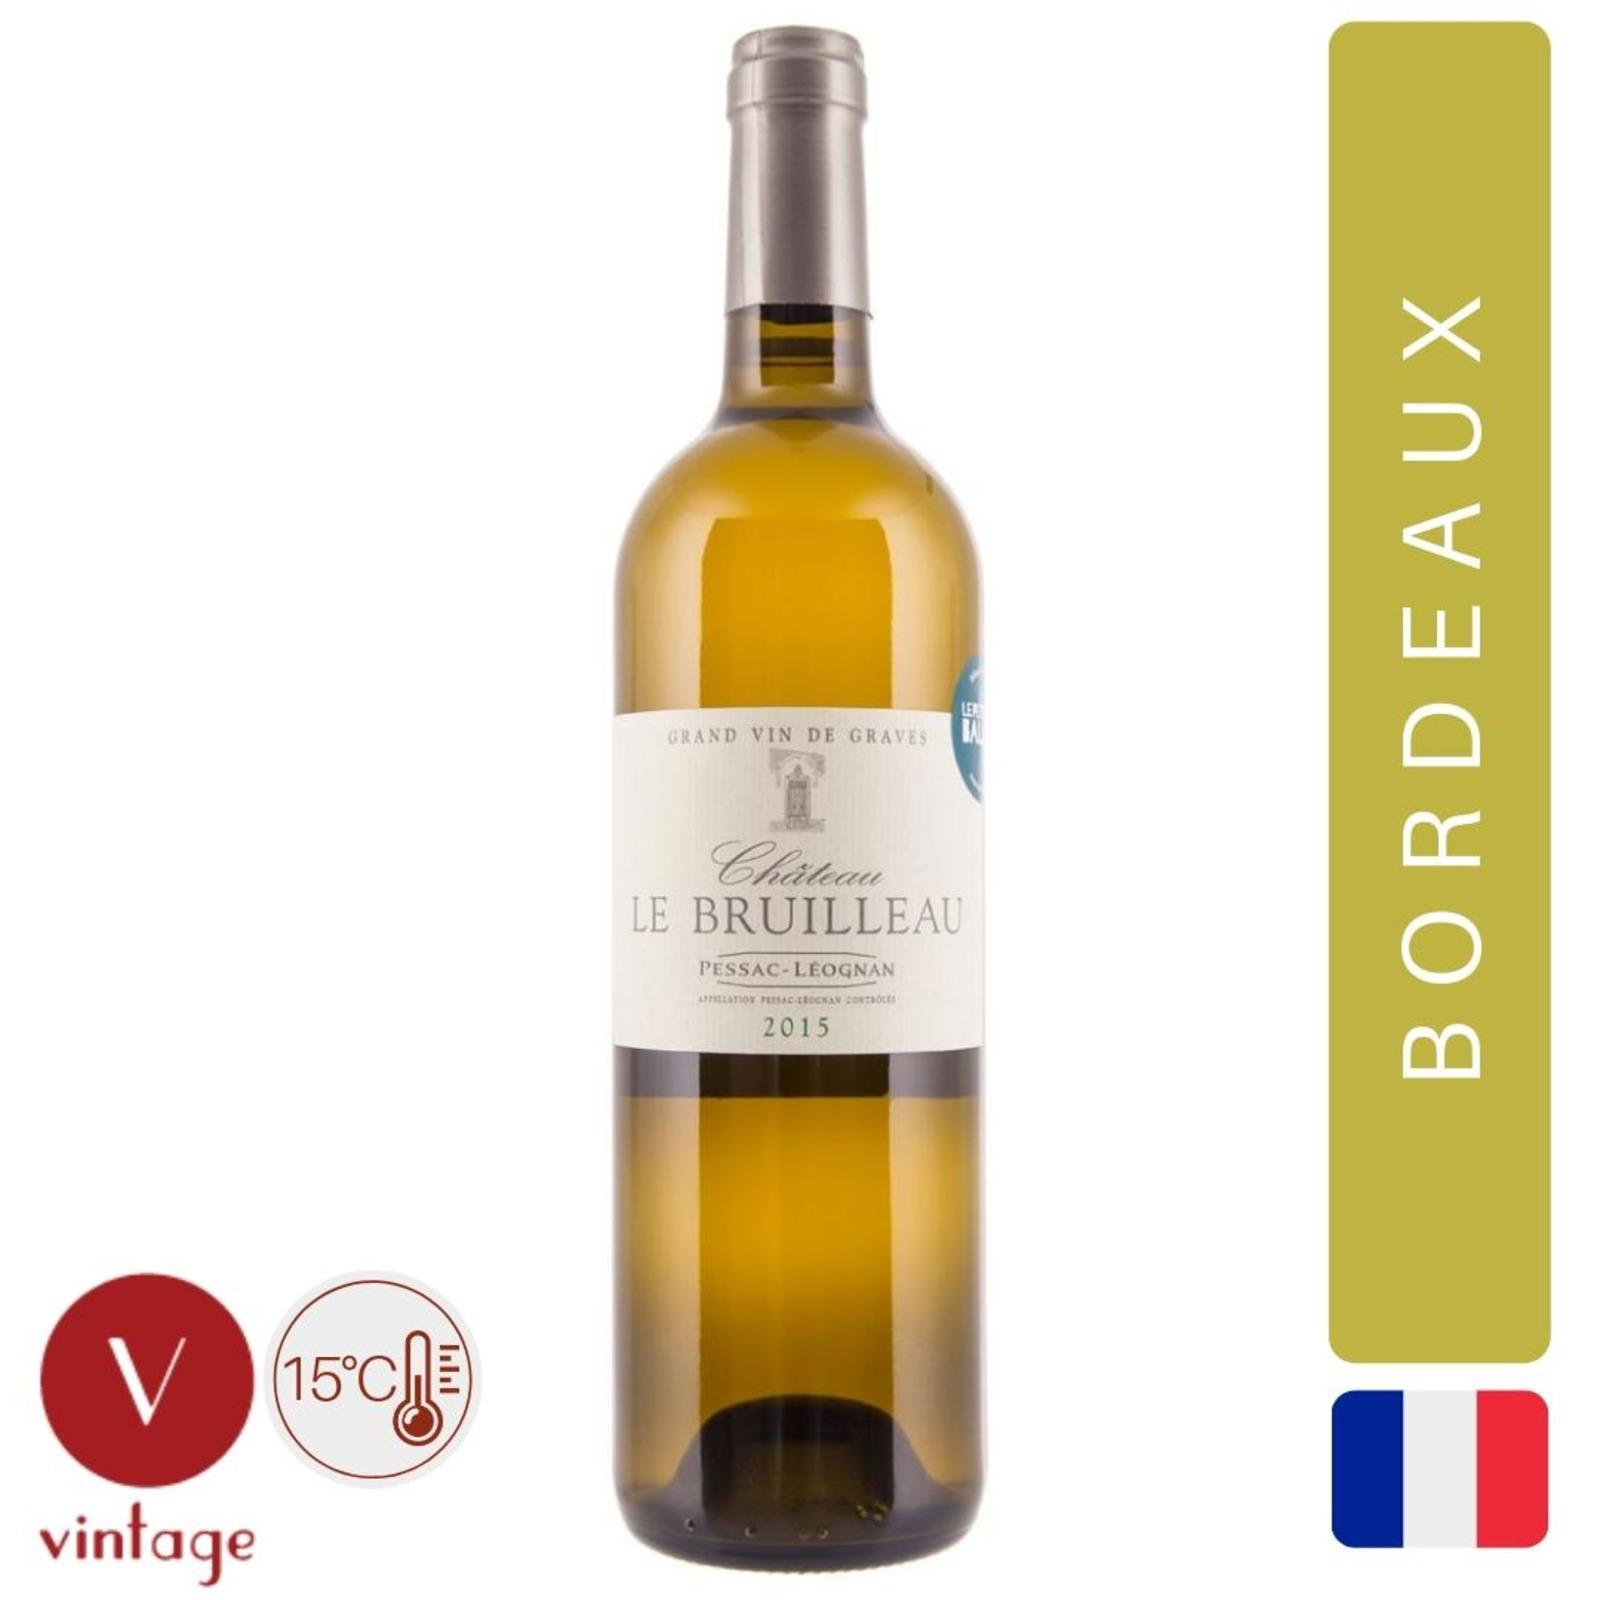 Chateau Le Bruilleau - Pessac Leognan - White Wine